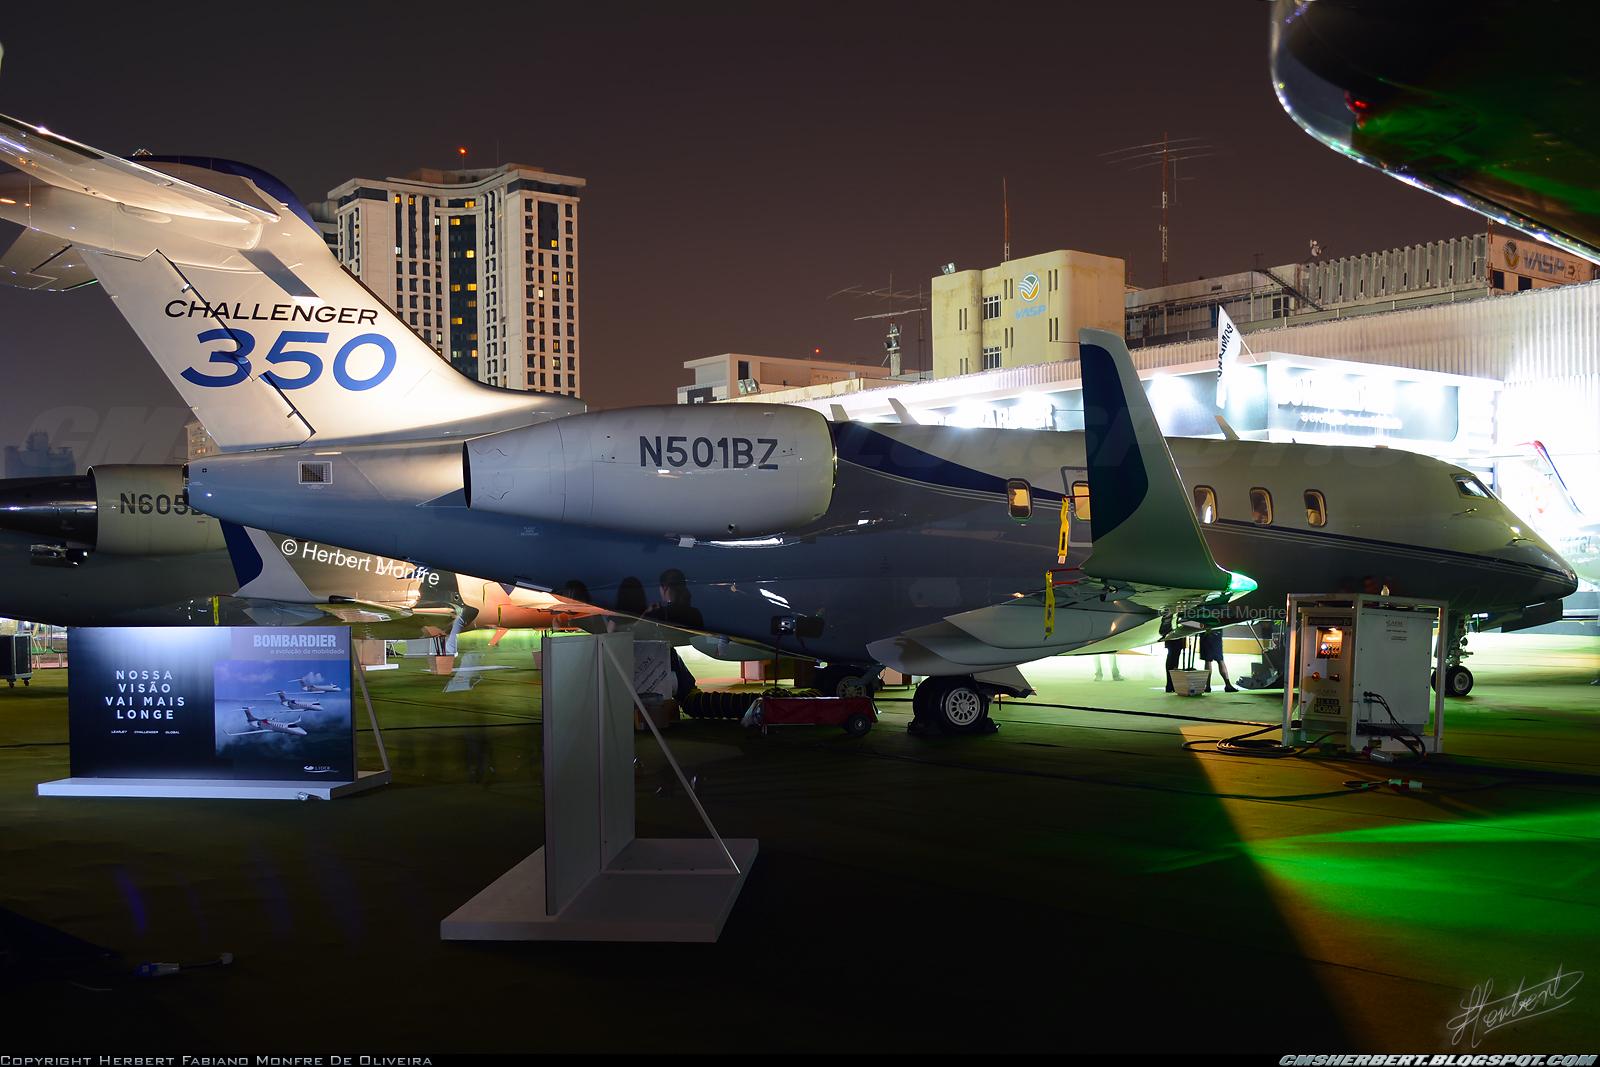 É MAIS QUE VOAR | Bombardier Challenger 350 aeronaves faz turnê na Polónia